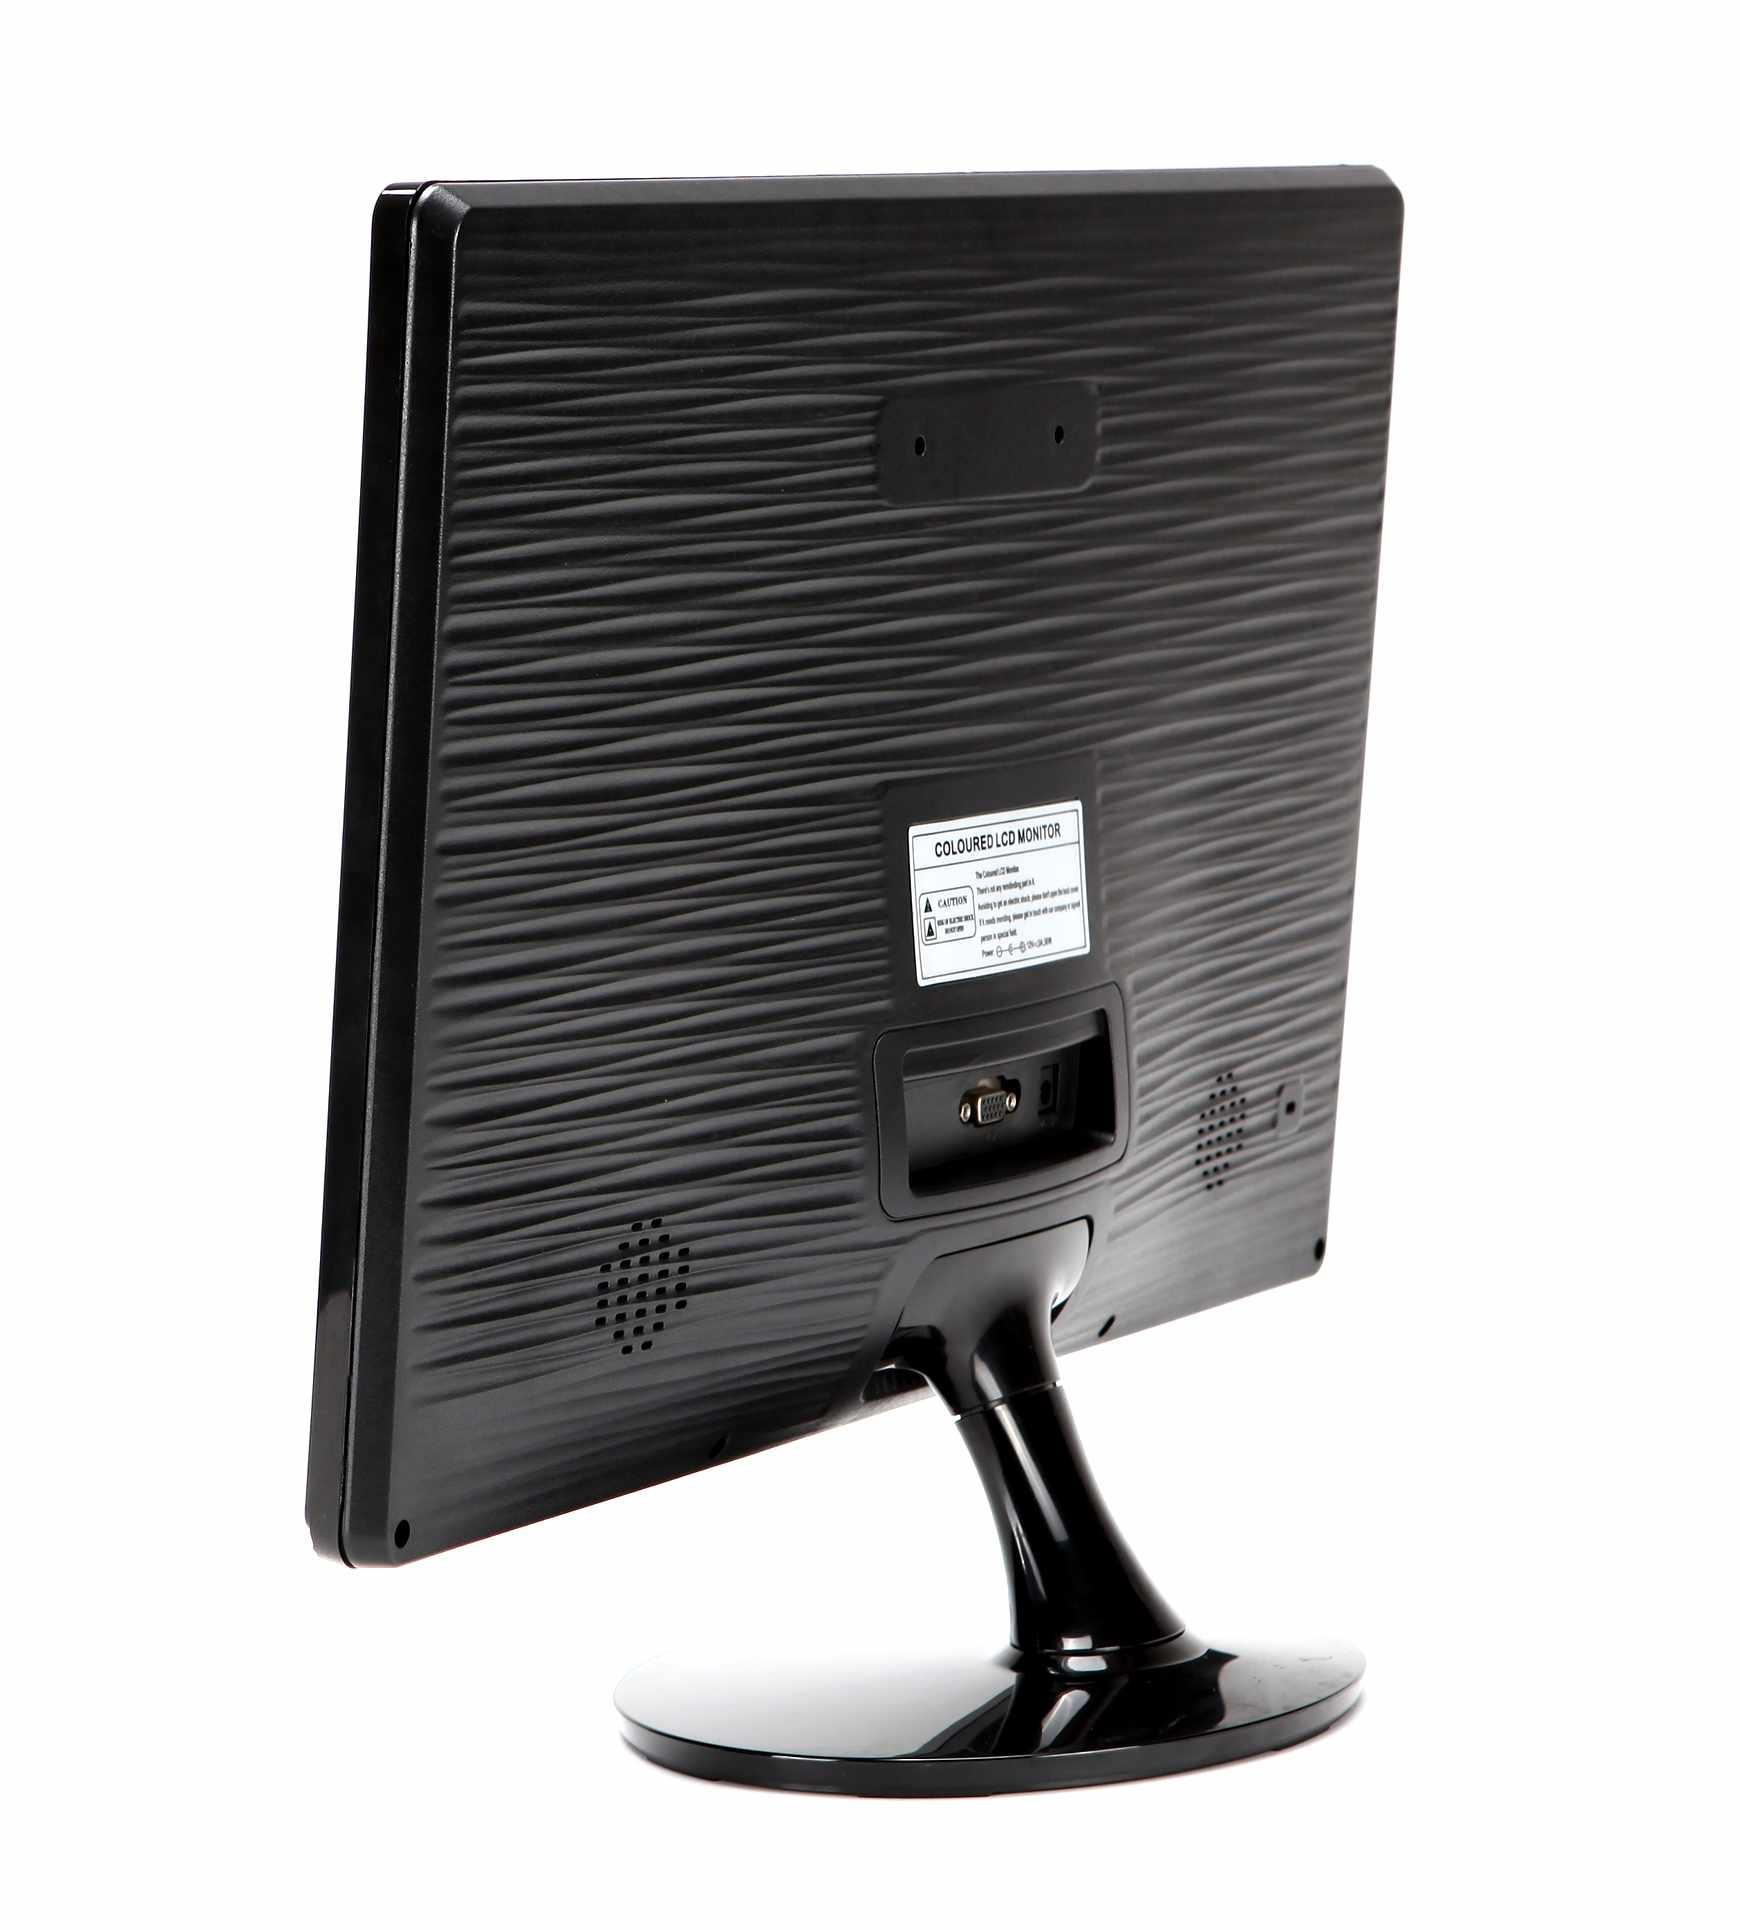 19.5 inch LED Monitor Full HD 1920x1080 IPS PC MONITOR computer